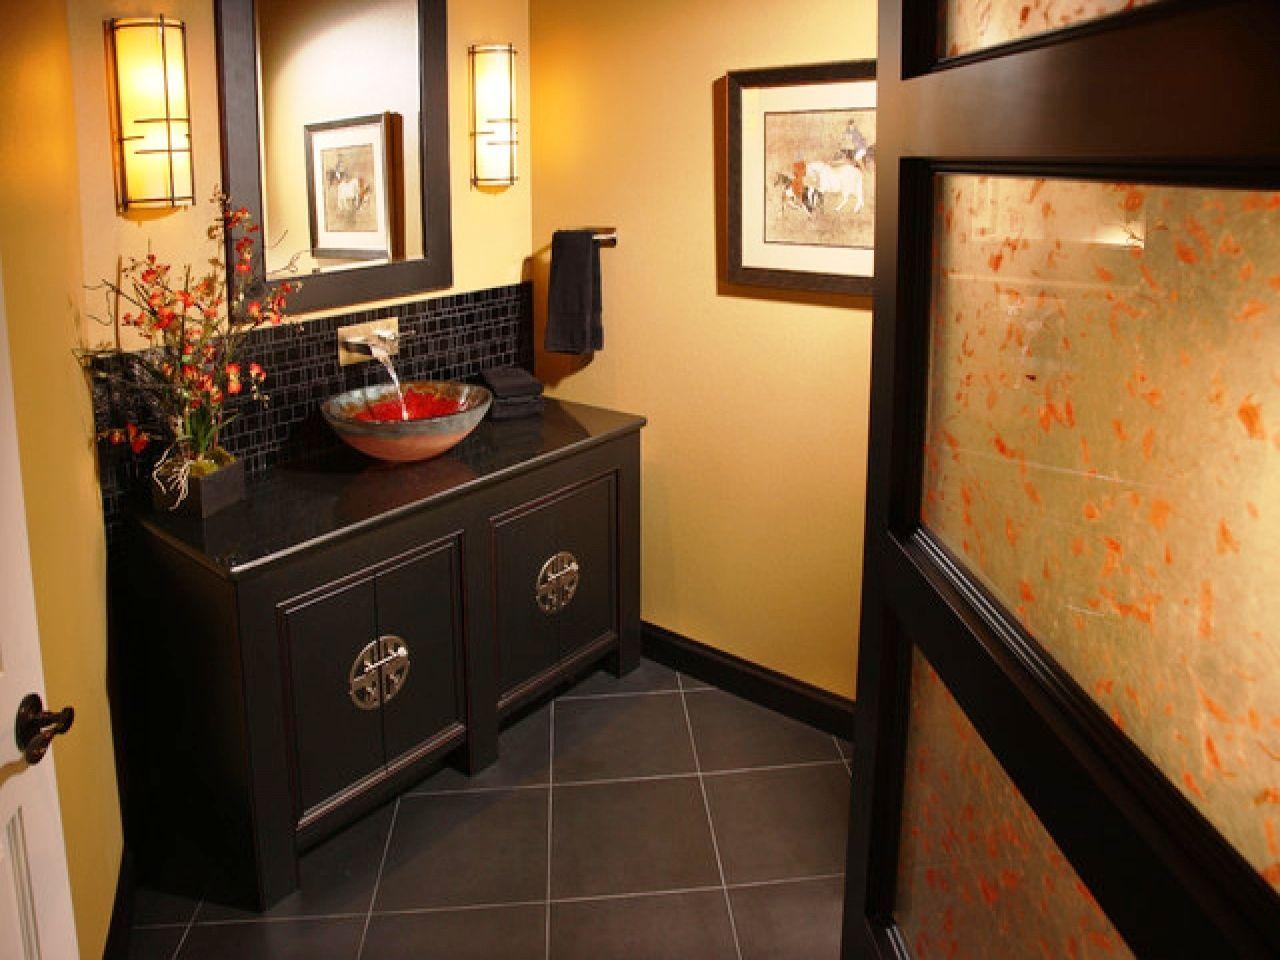 15 Awesome Asian Bathroom Design Ideas For 2018 Asian Bathroom